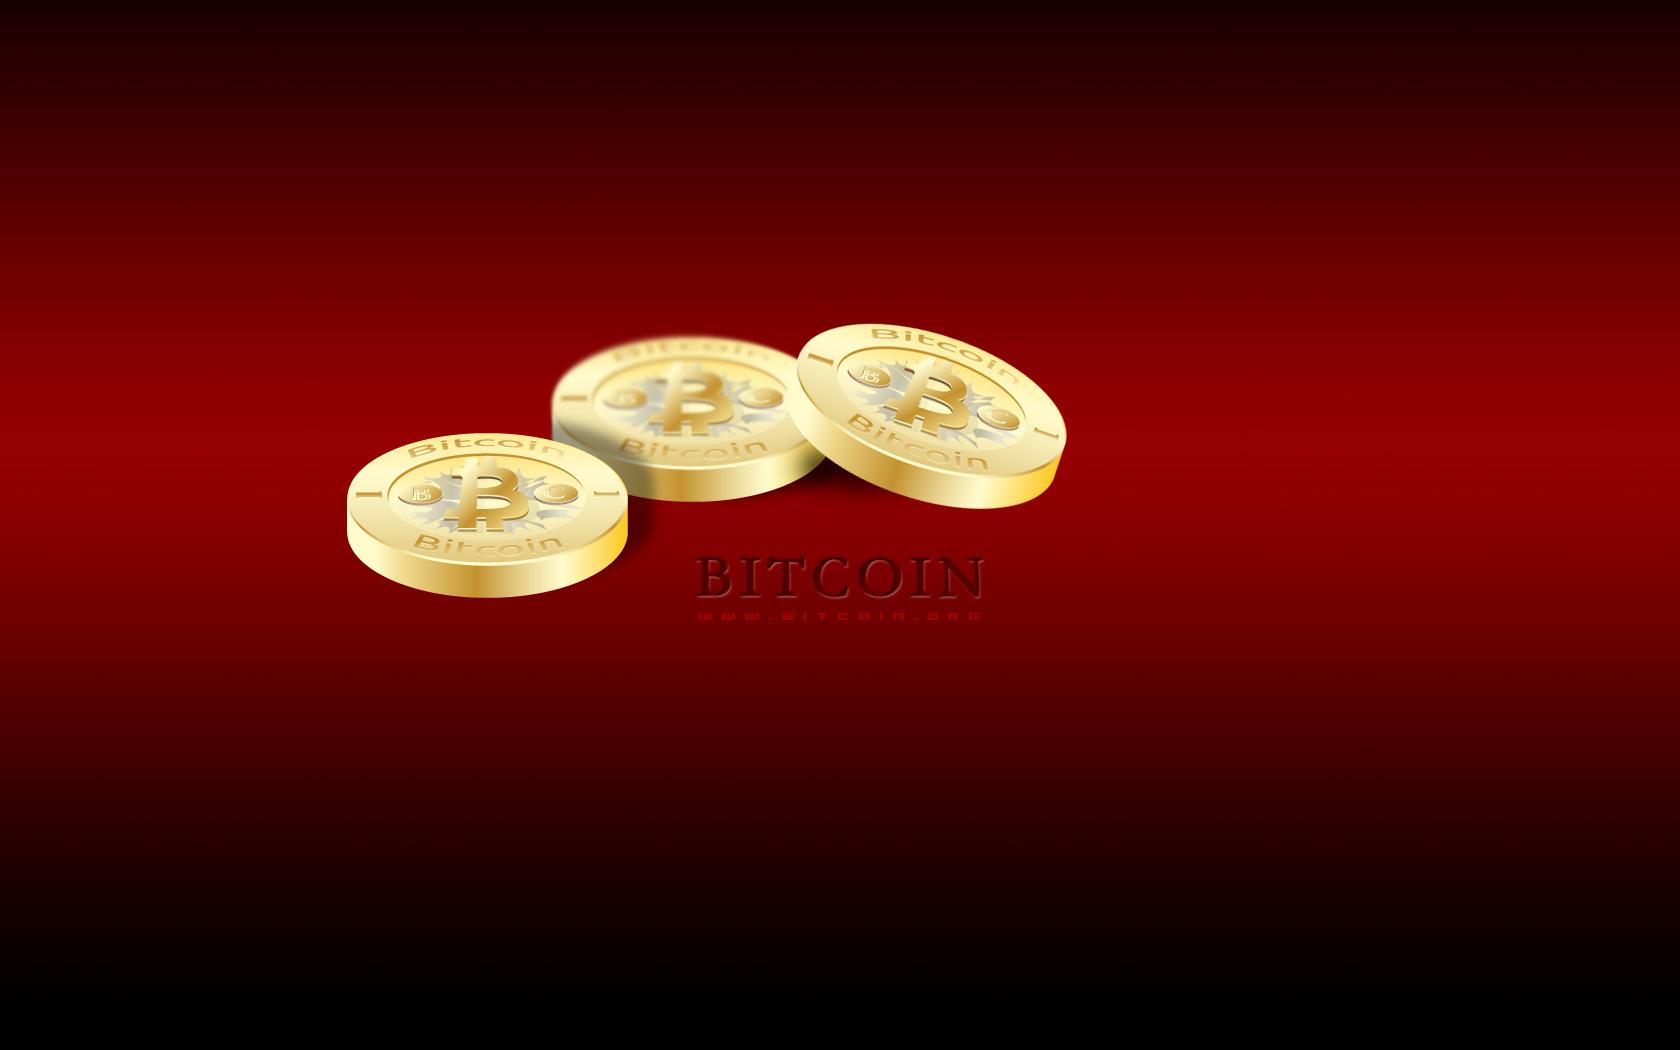 Bitcoin DskTp Wallpaper Red 4